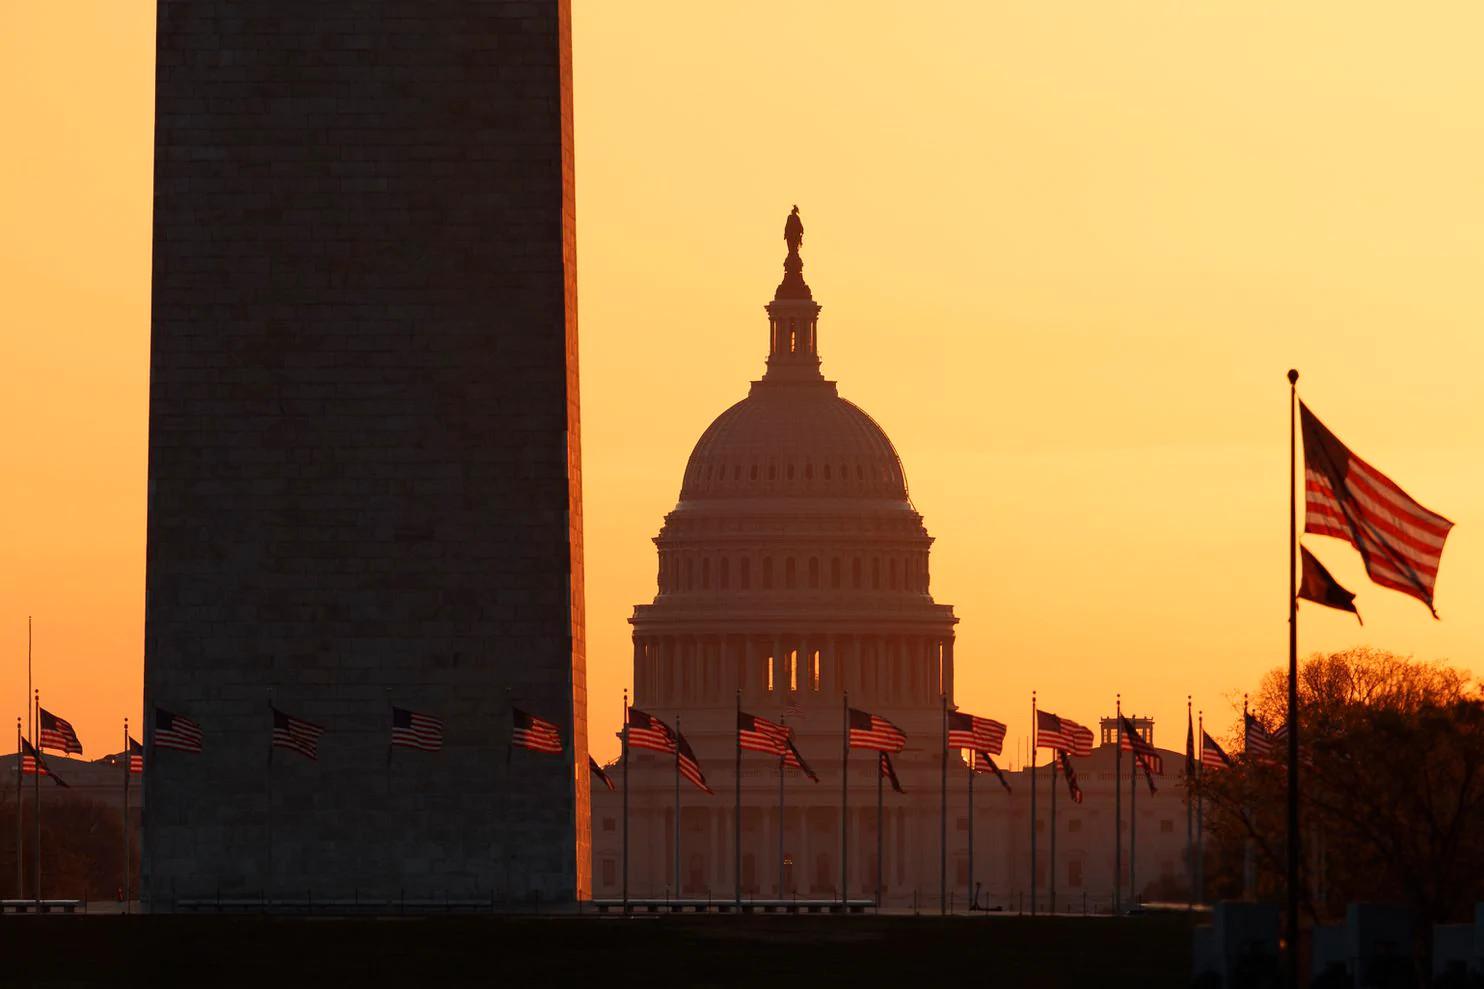 Америчке заставе испред Капитола у Вашингтону у зору (Фото: Carolyn Kaster/AP)